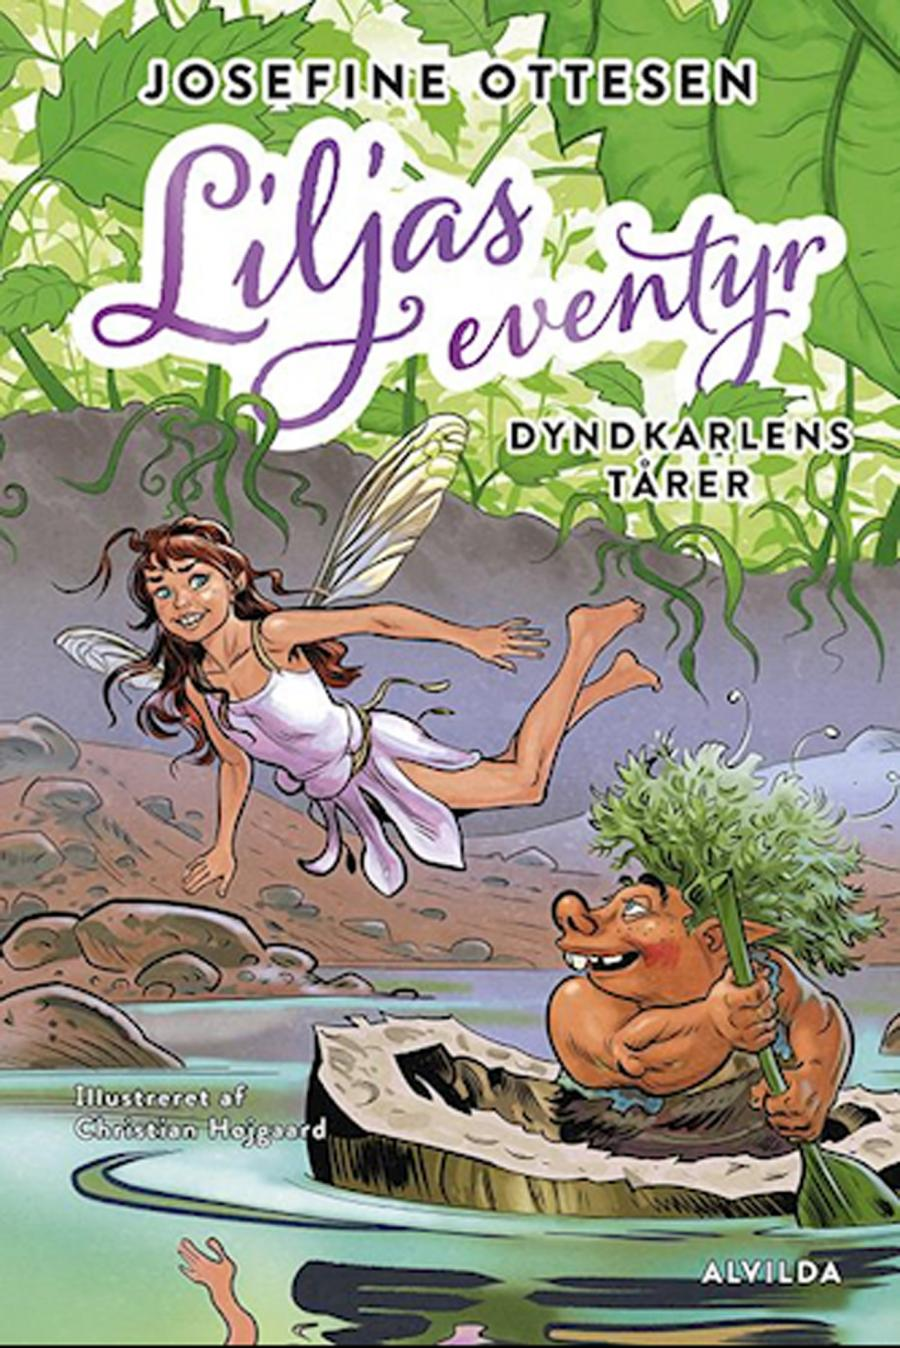 Liljas eventyr - Dyndkarlens tårer